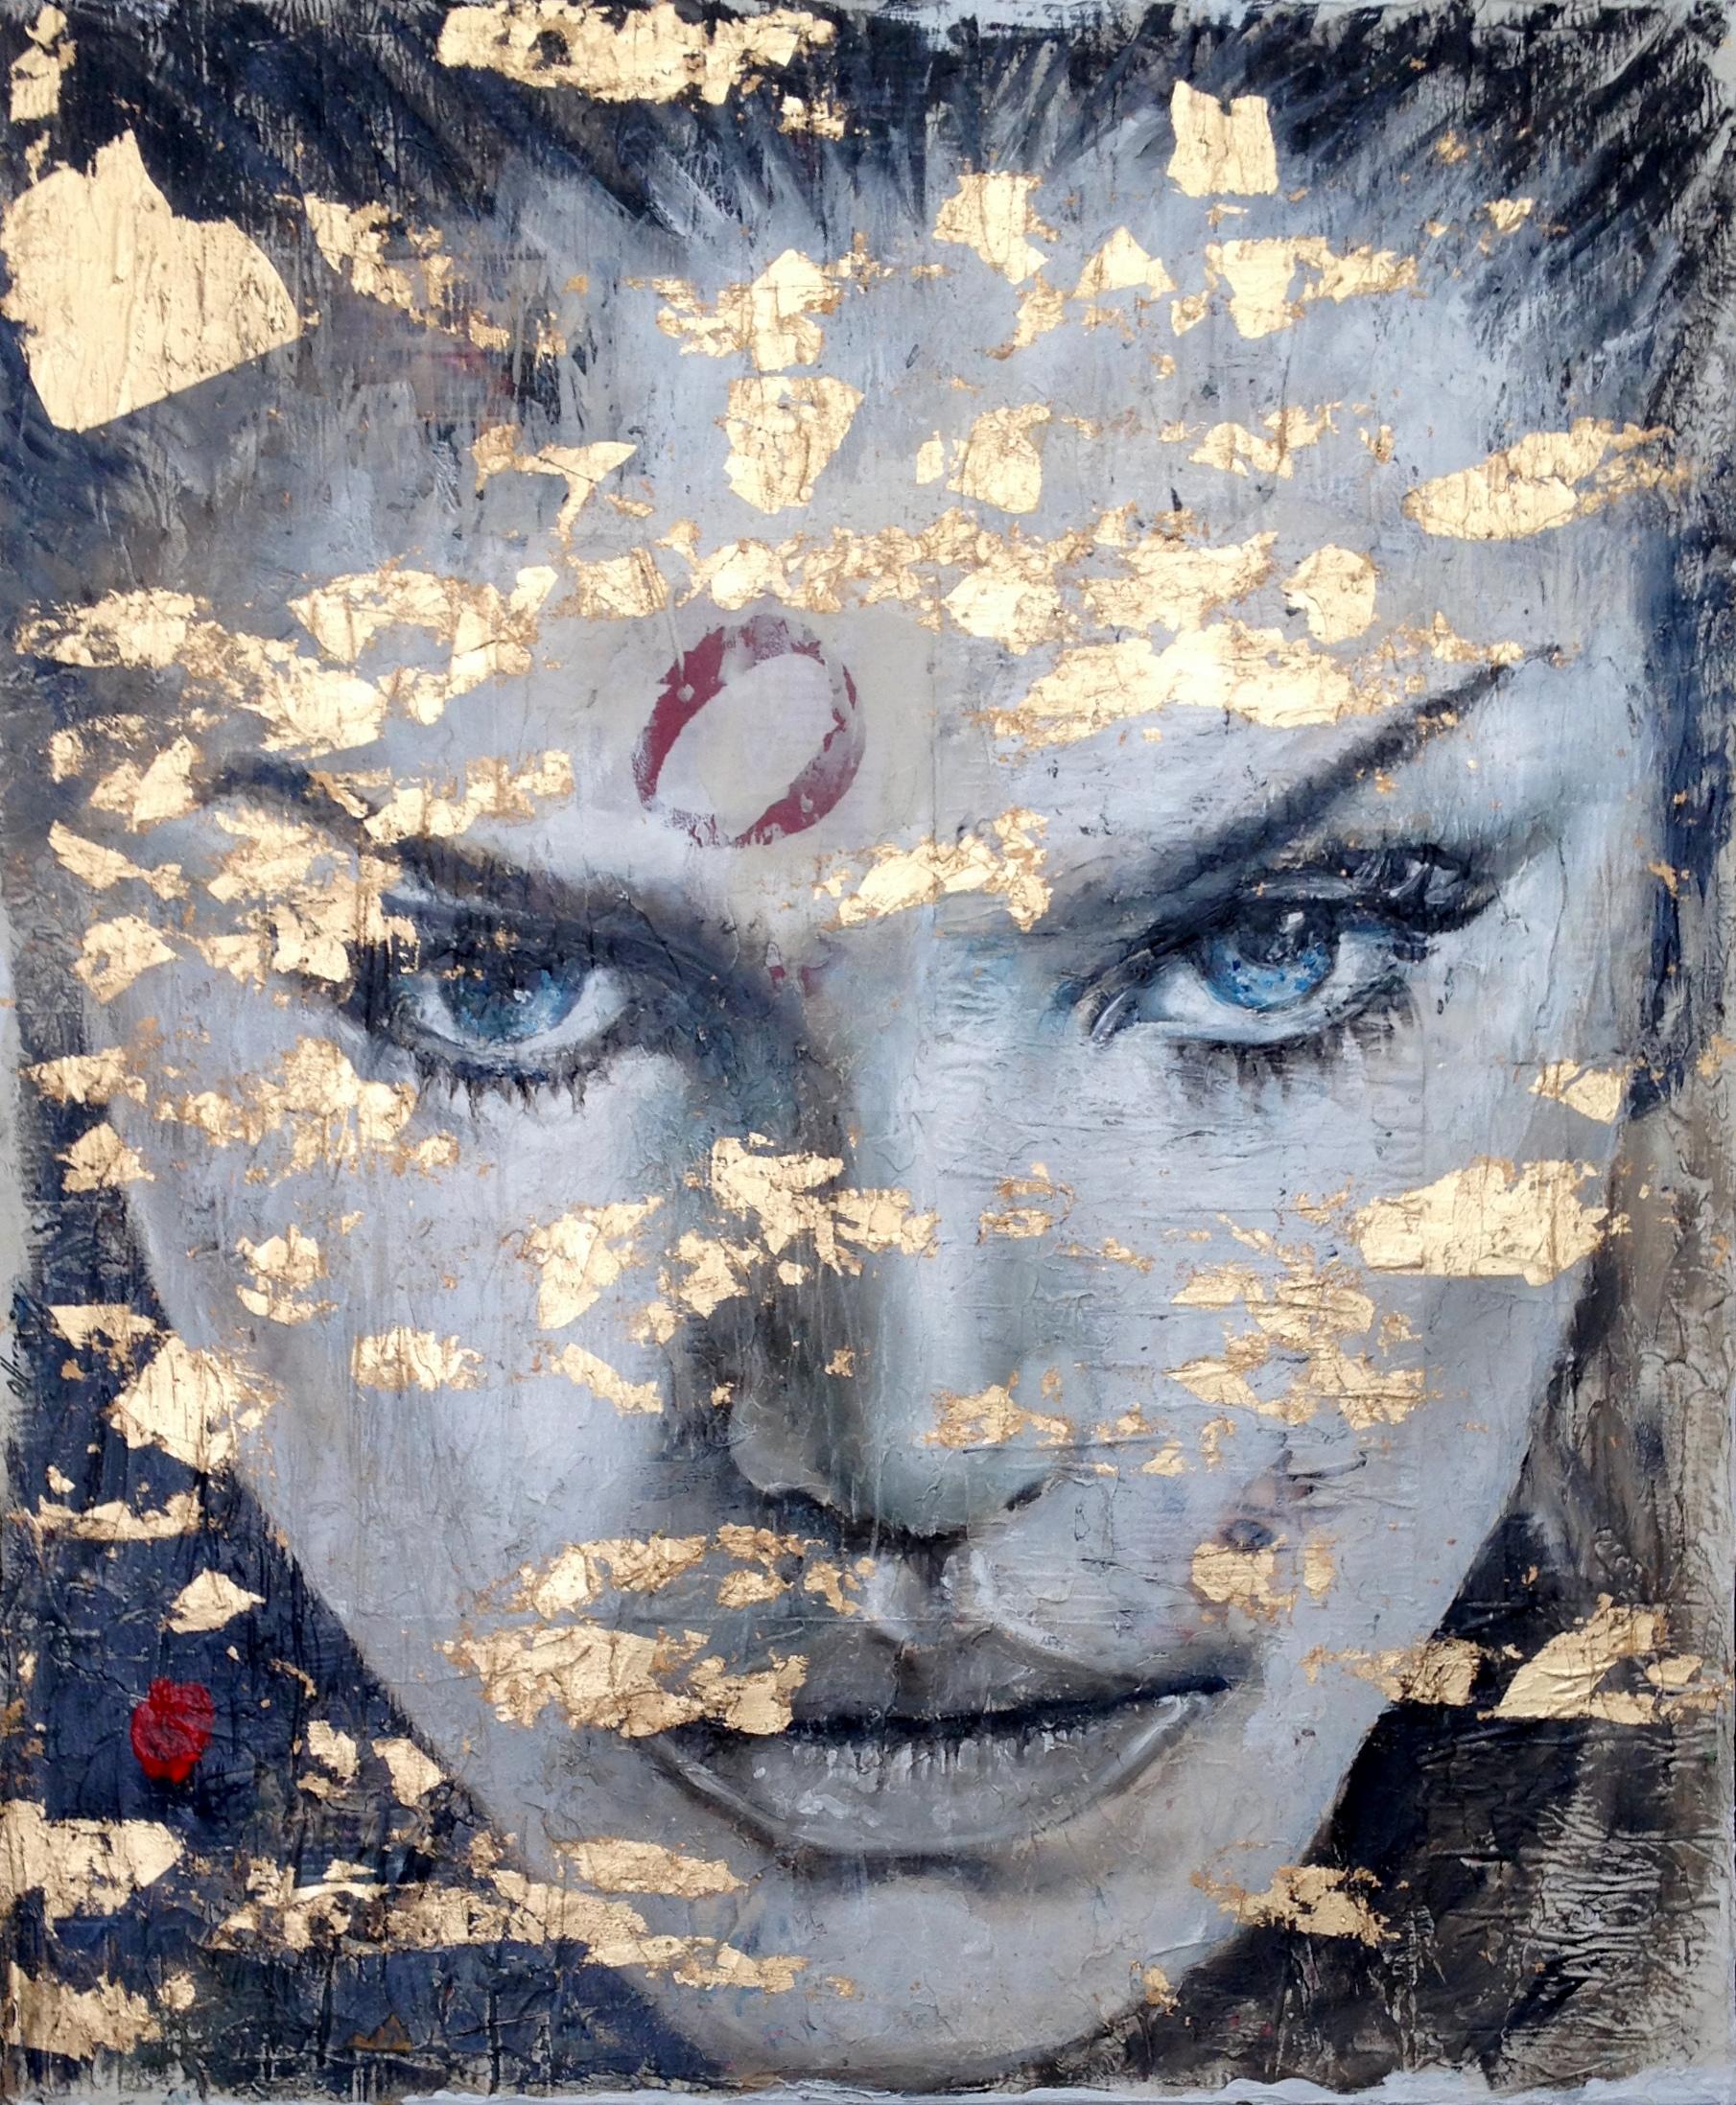 WOMAN VI / 111 x 91 cm